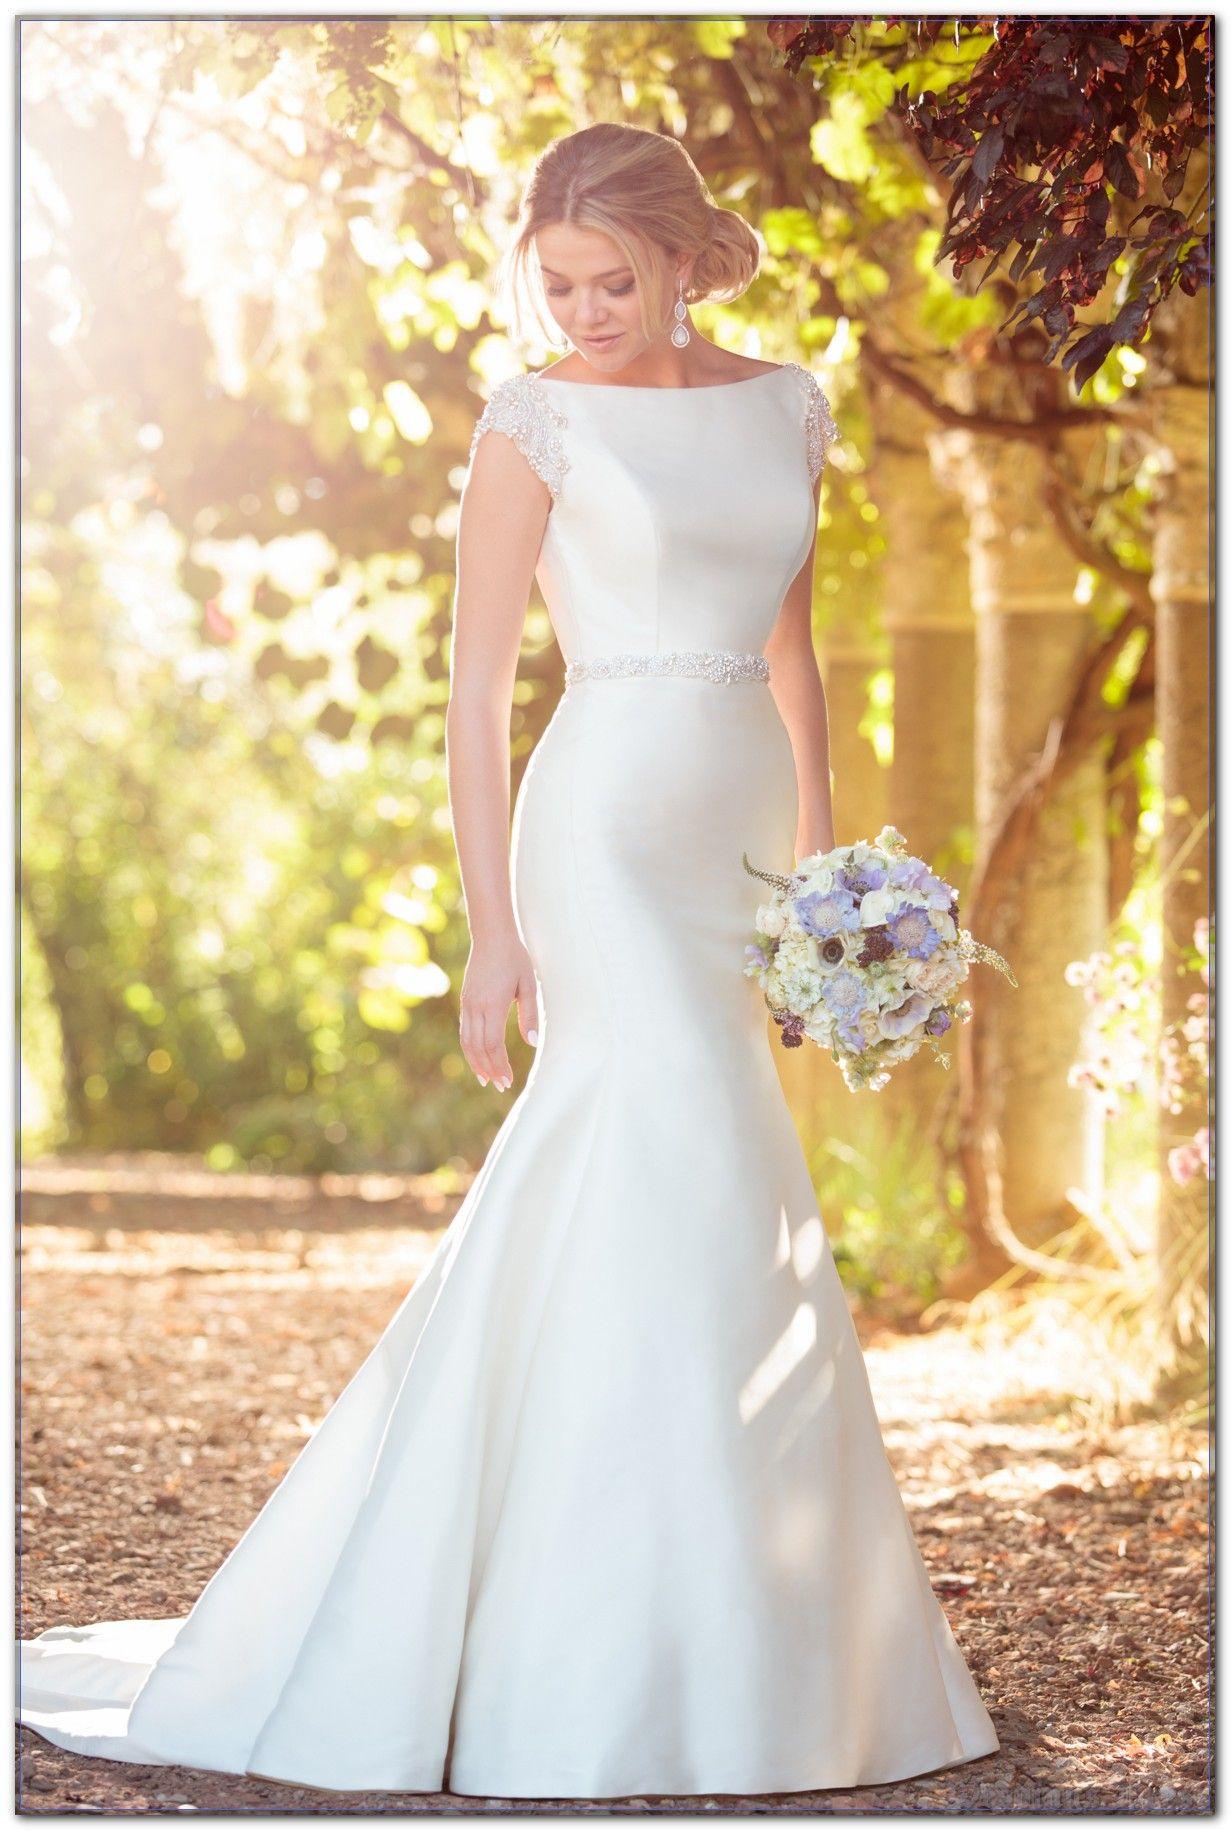 3 Weddings Dress Secrets You Never Knew